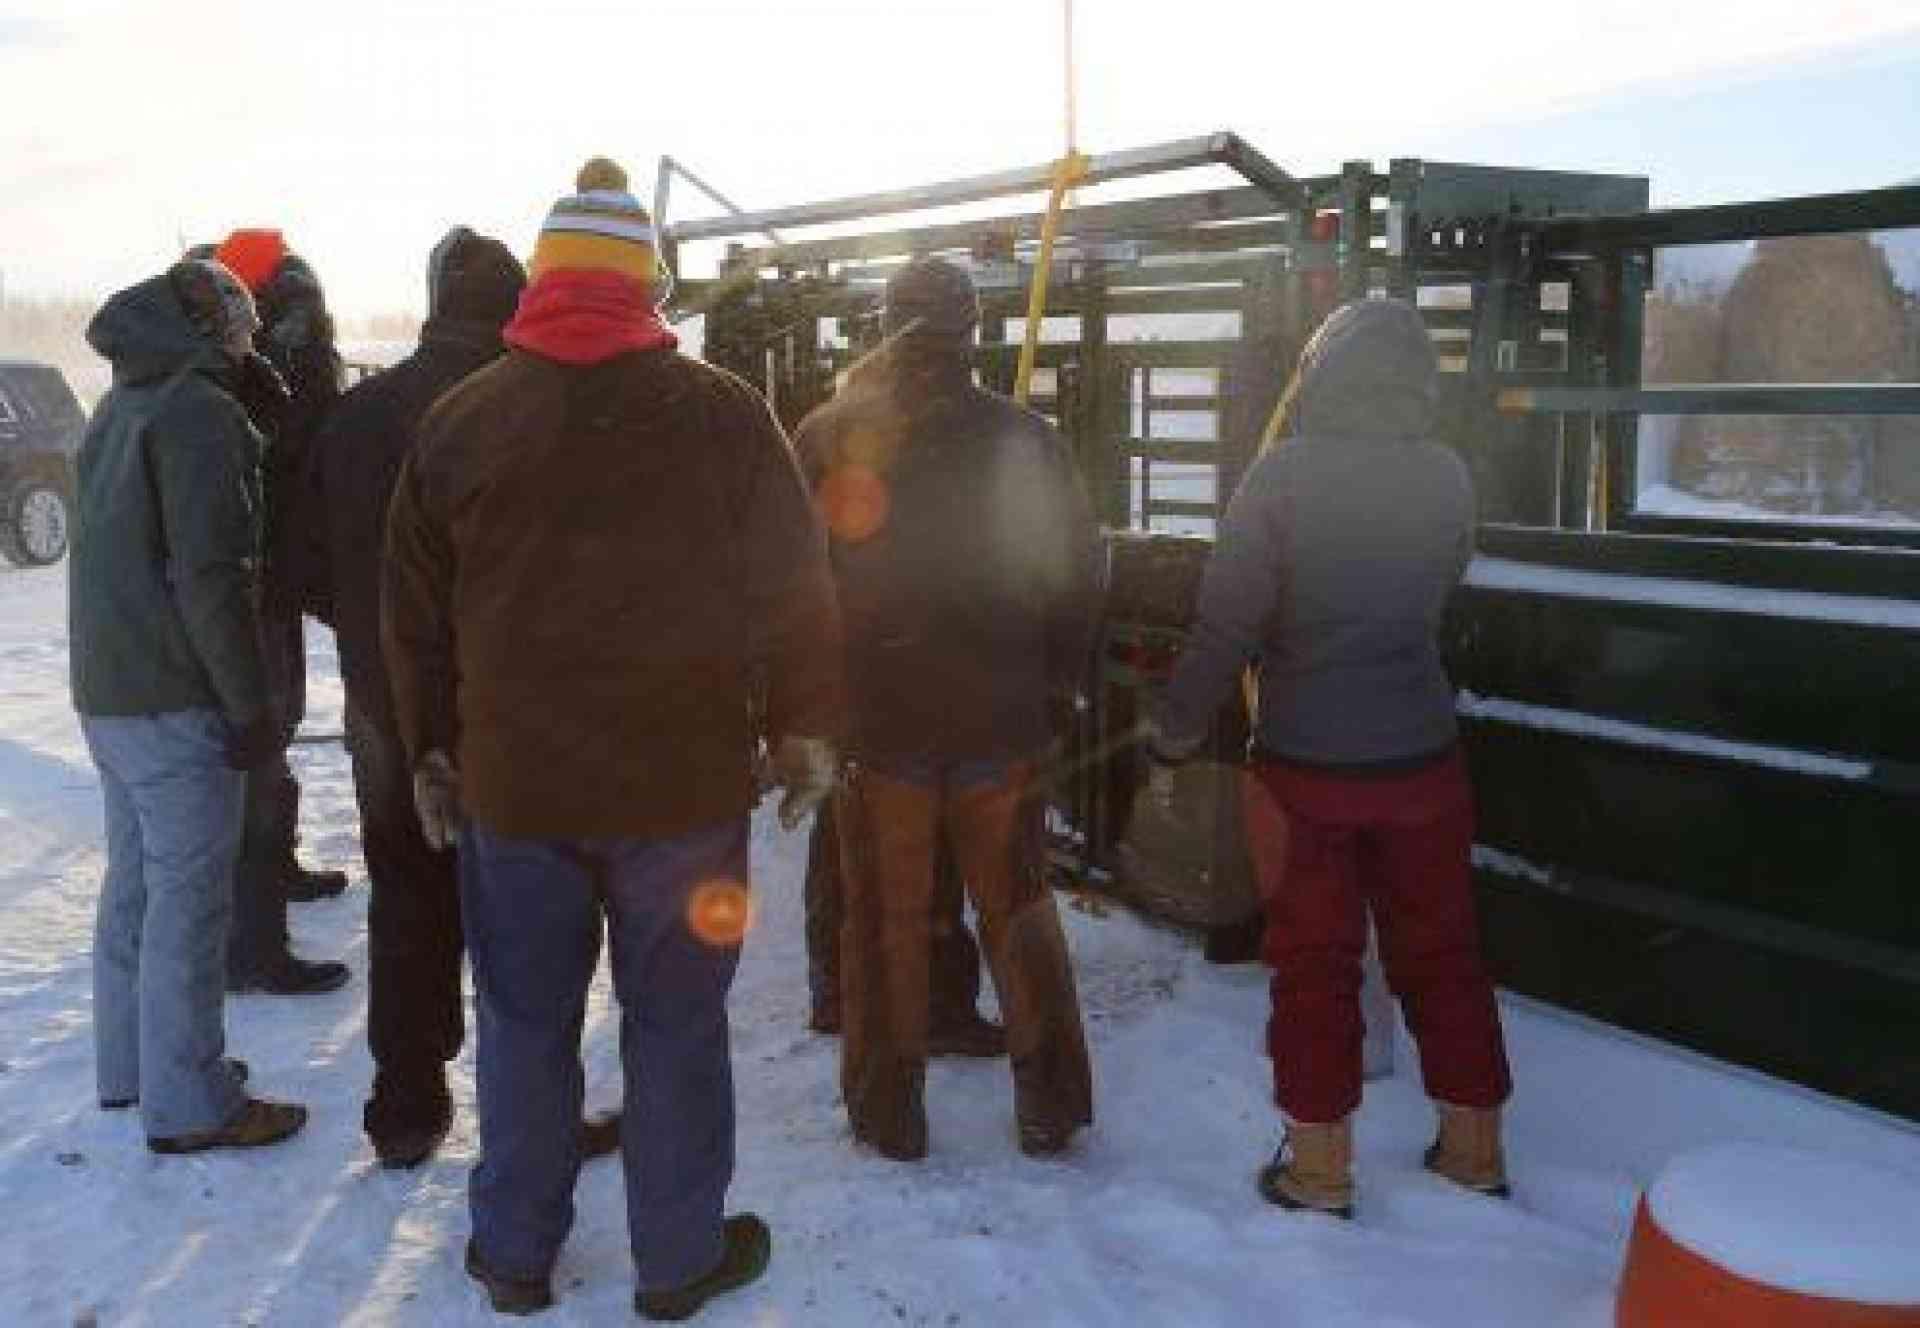 Winter Livestock Care